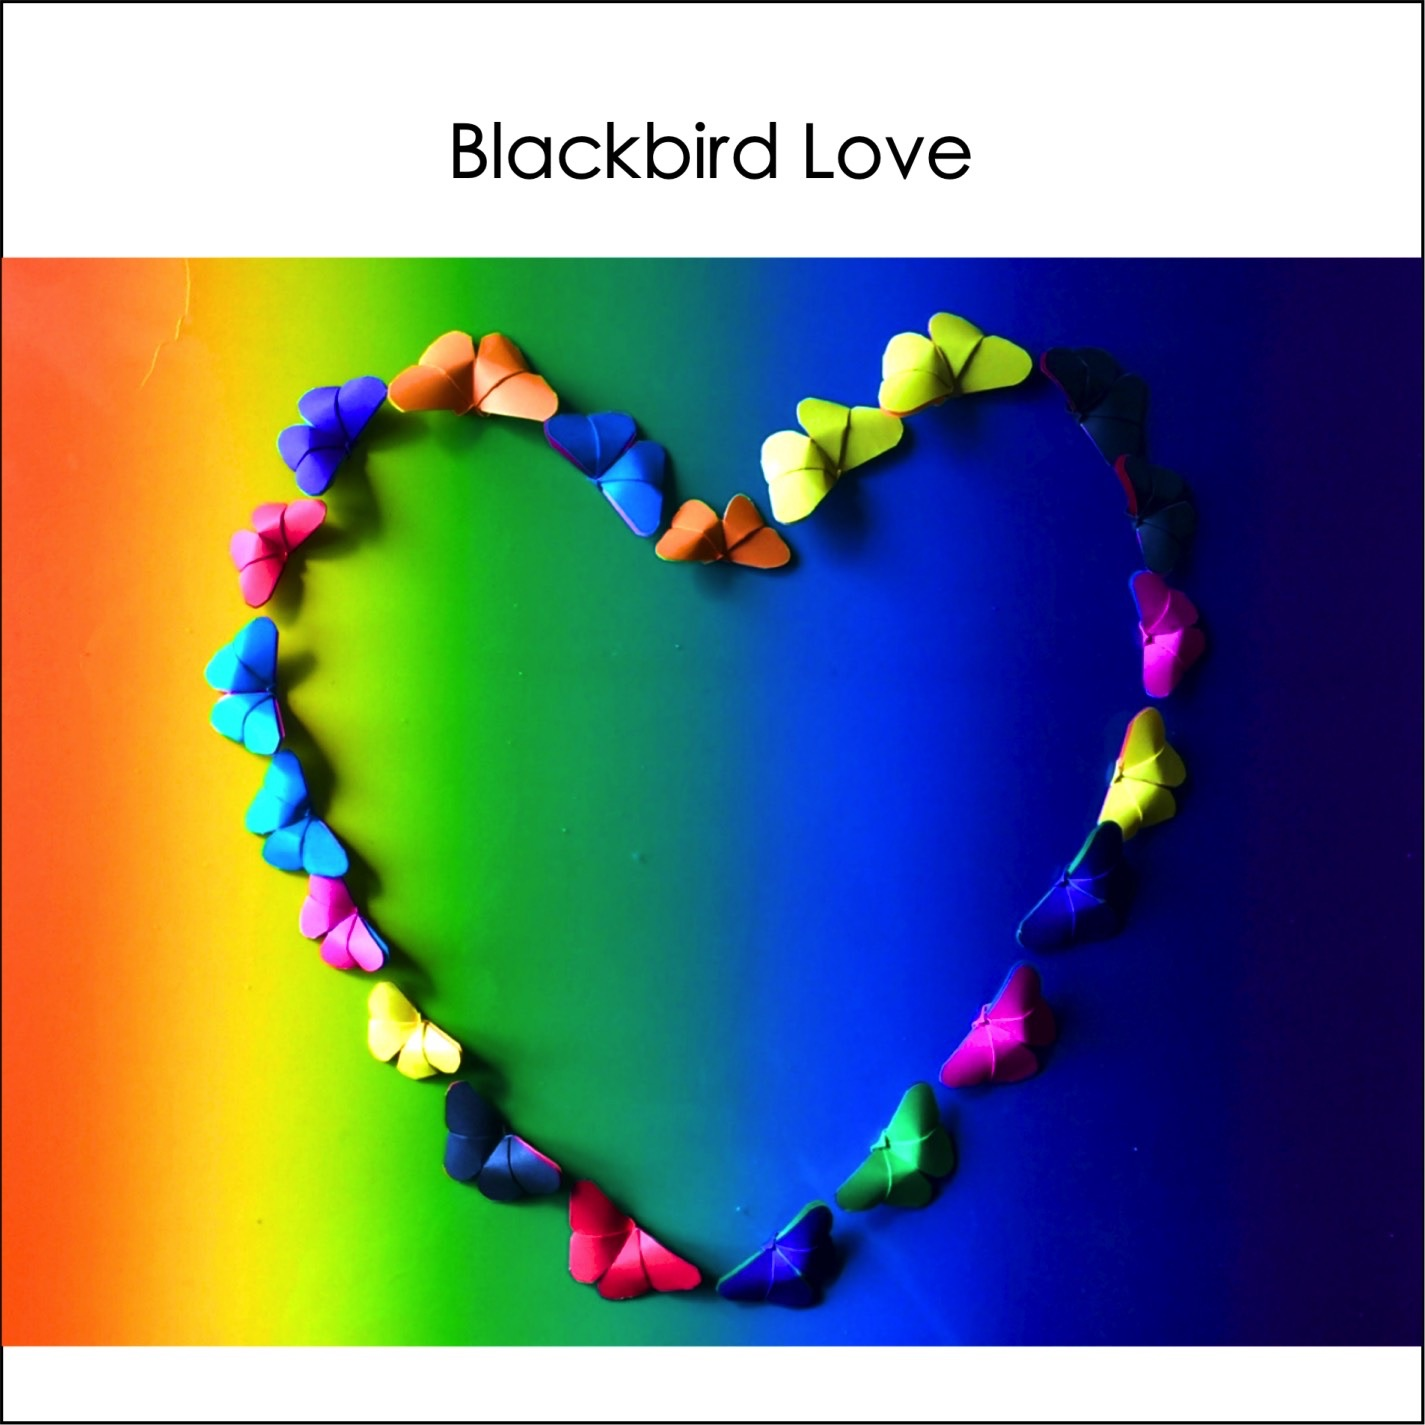 Blackbird Love (Instrumental Piano Solo) - Sad Melancholy Emotional Music